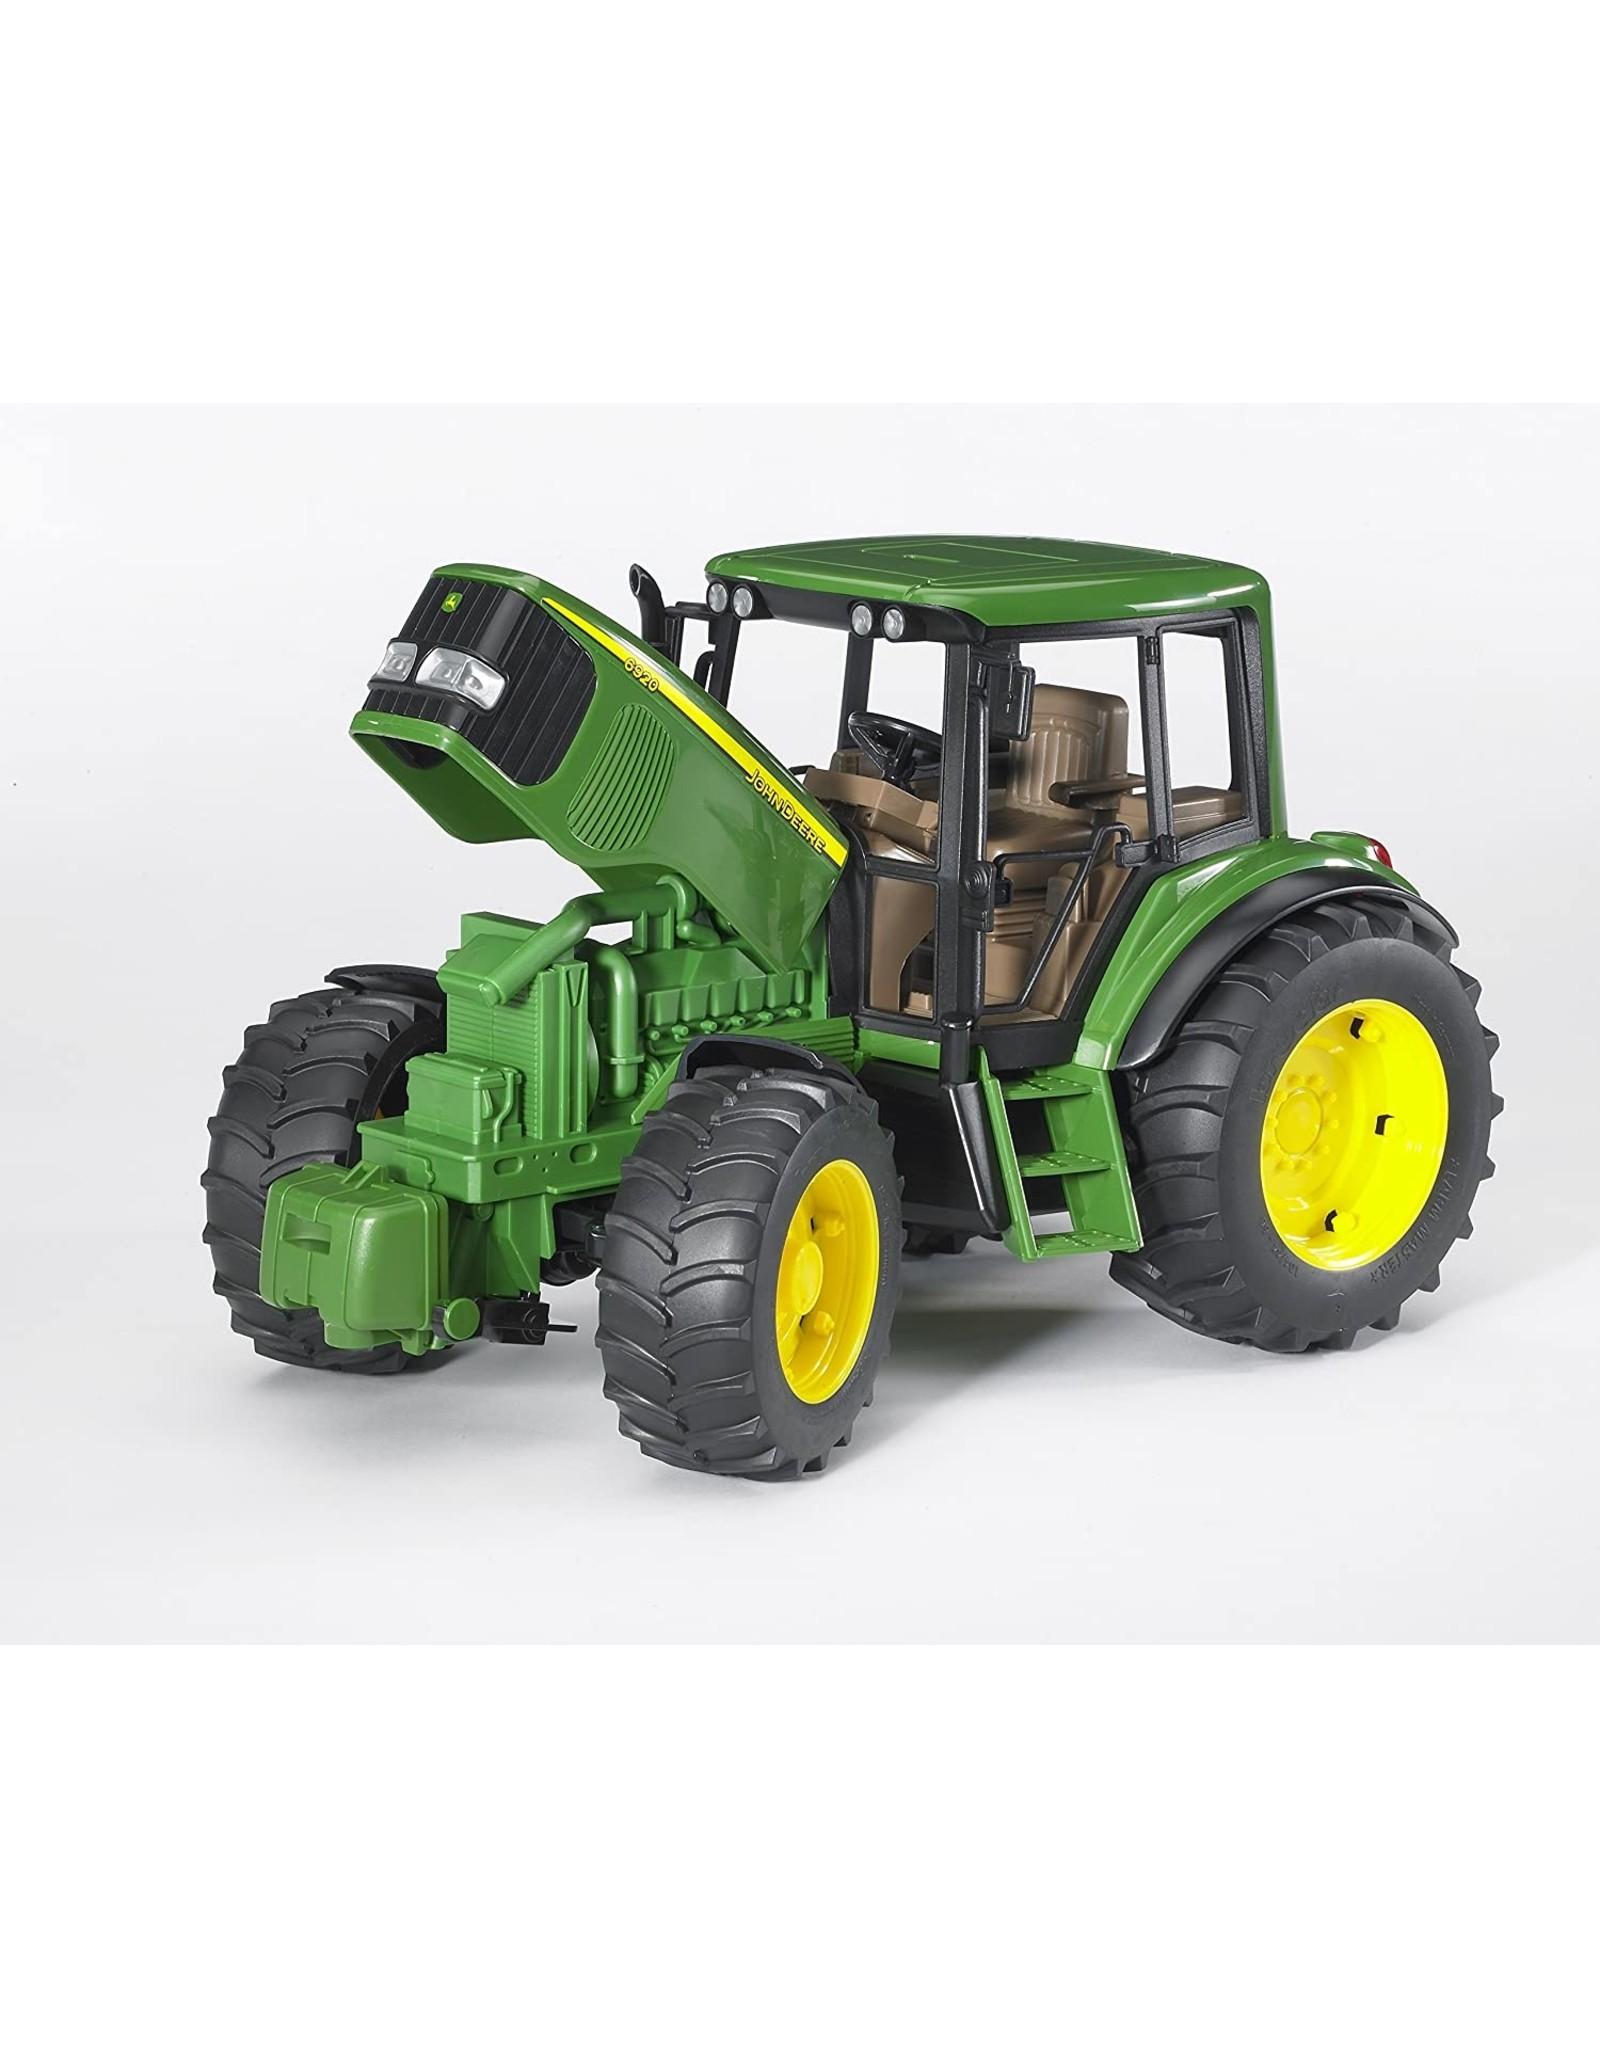 John Deere Tractor 6920 w/ Front Loader